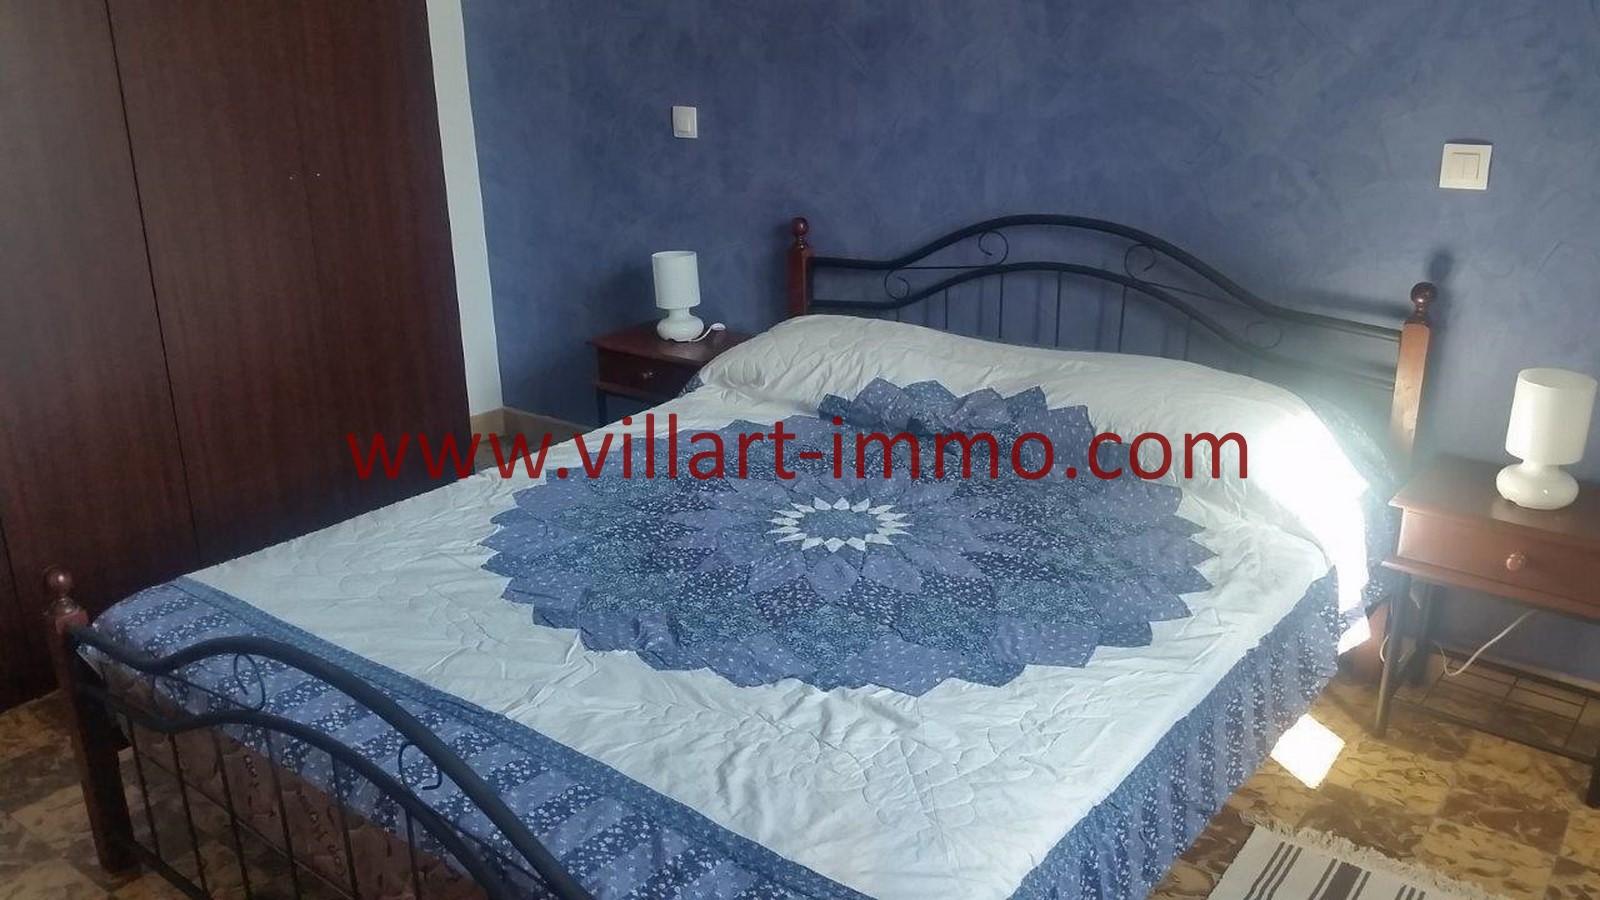 7-location-appartement-meuble-centre-ville-tanger-chambre-2-l966-villart-immo